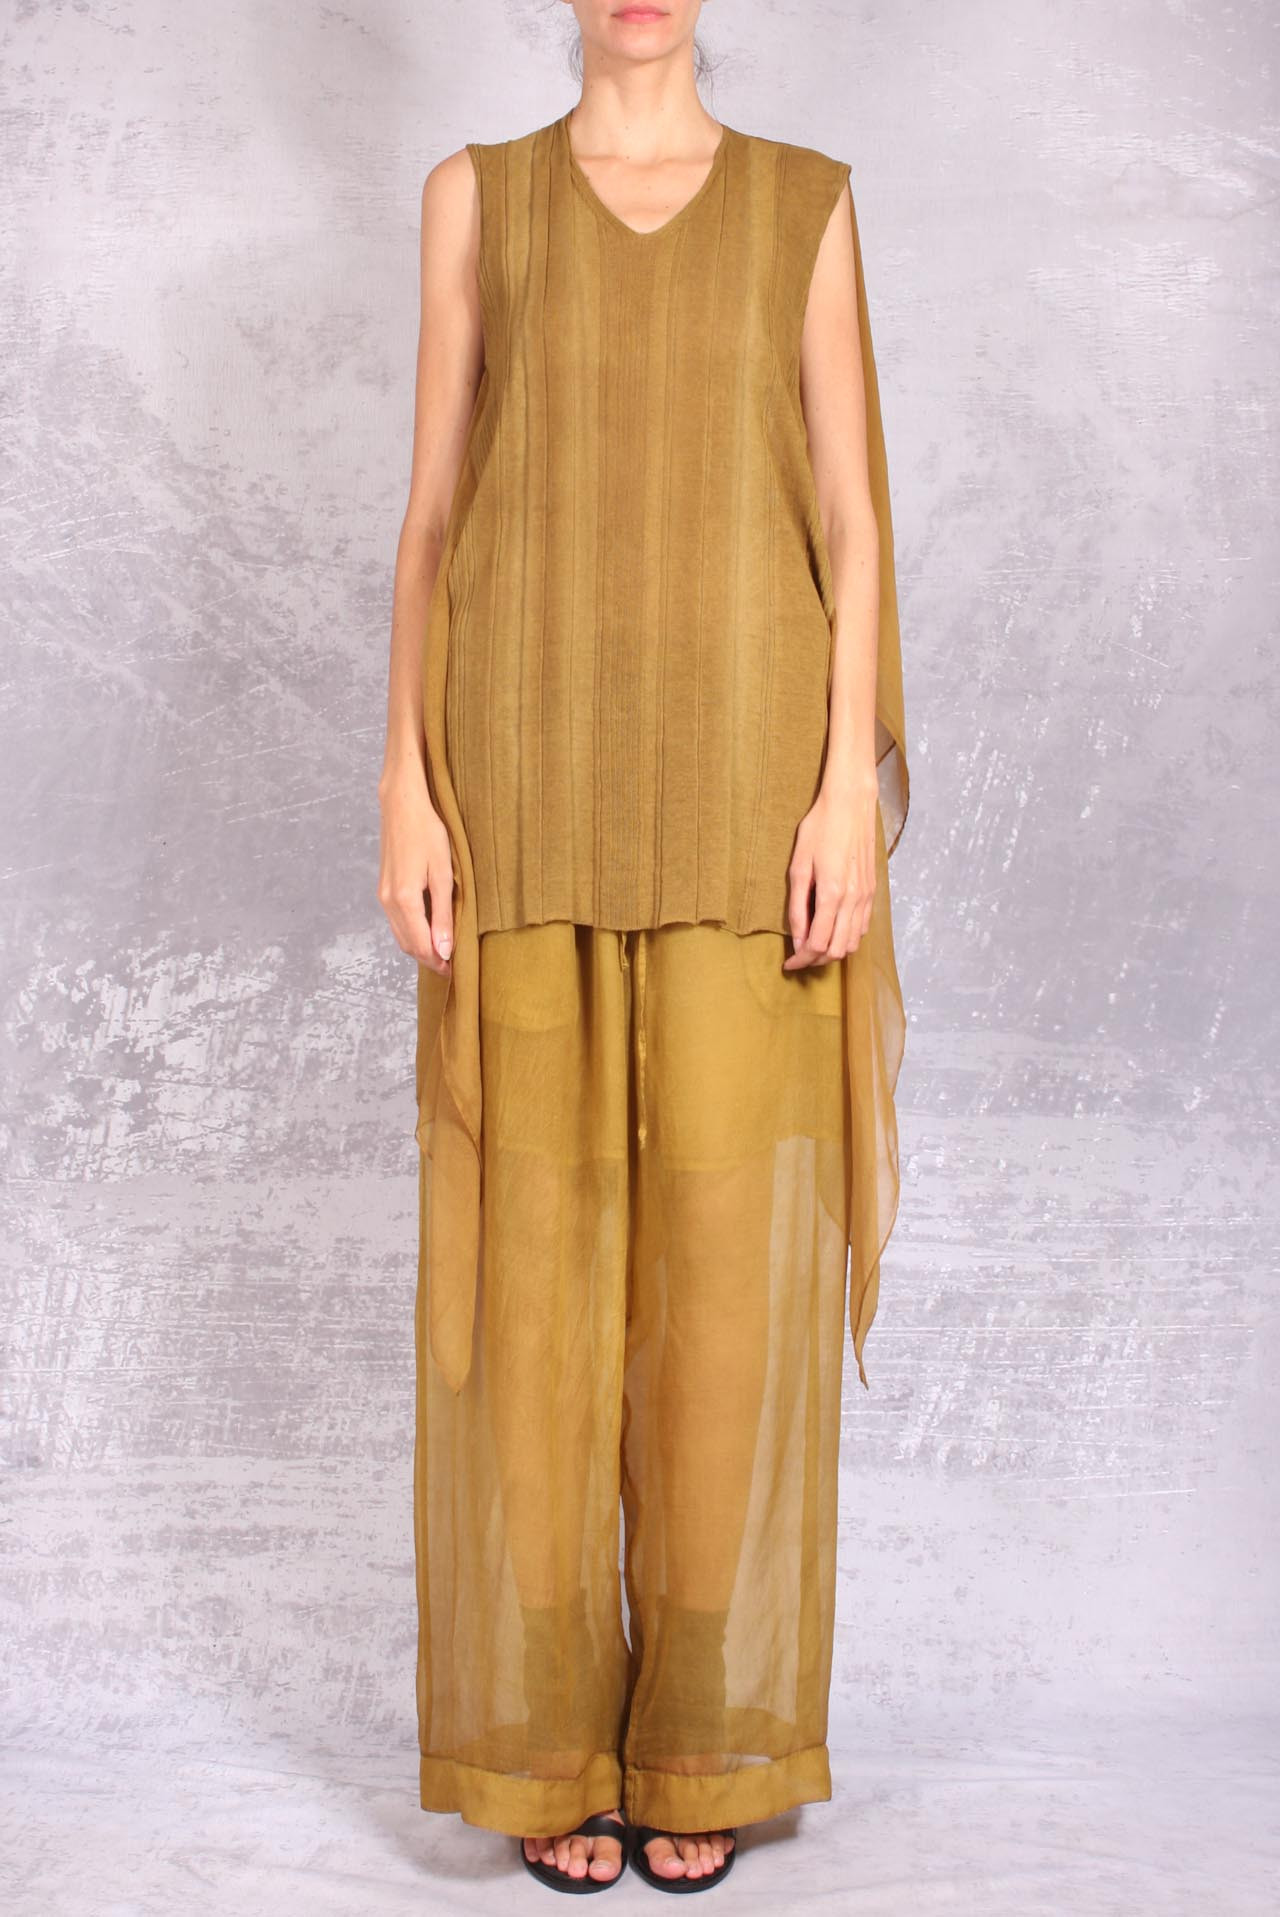 Masnada dress